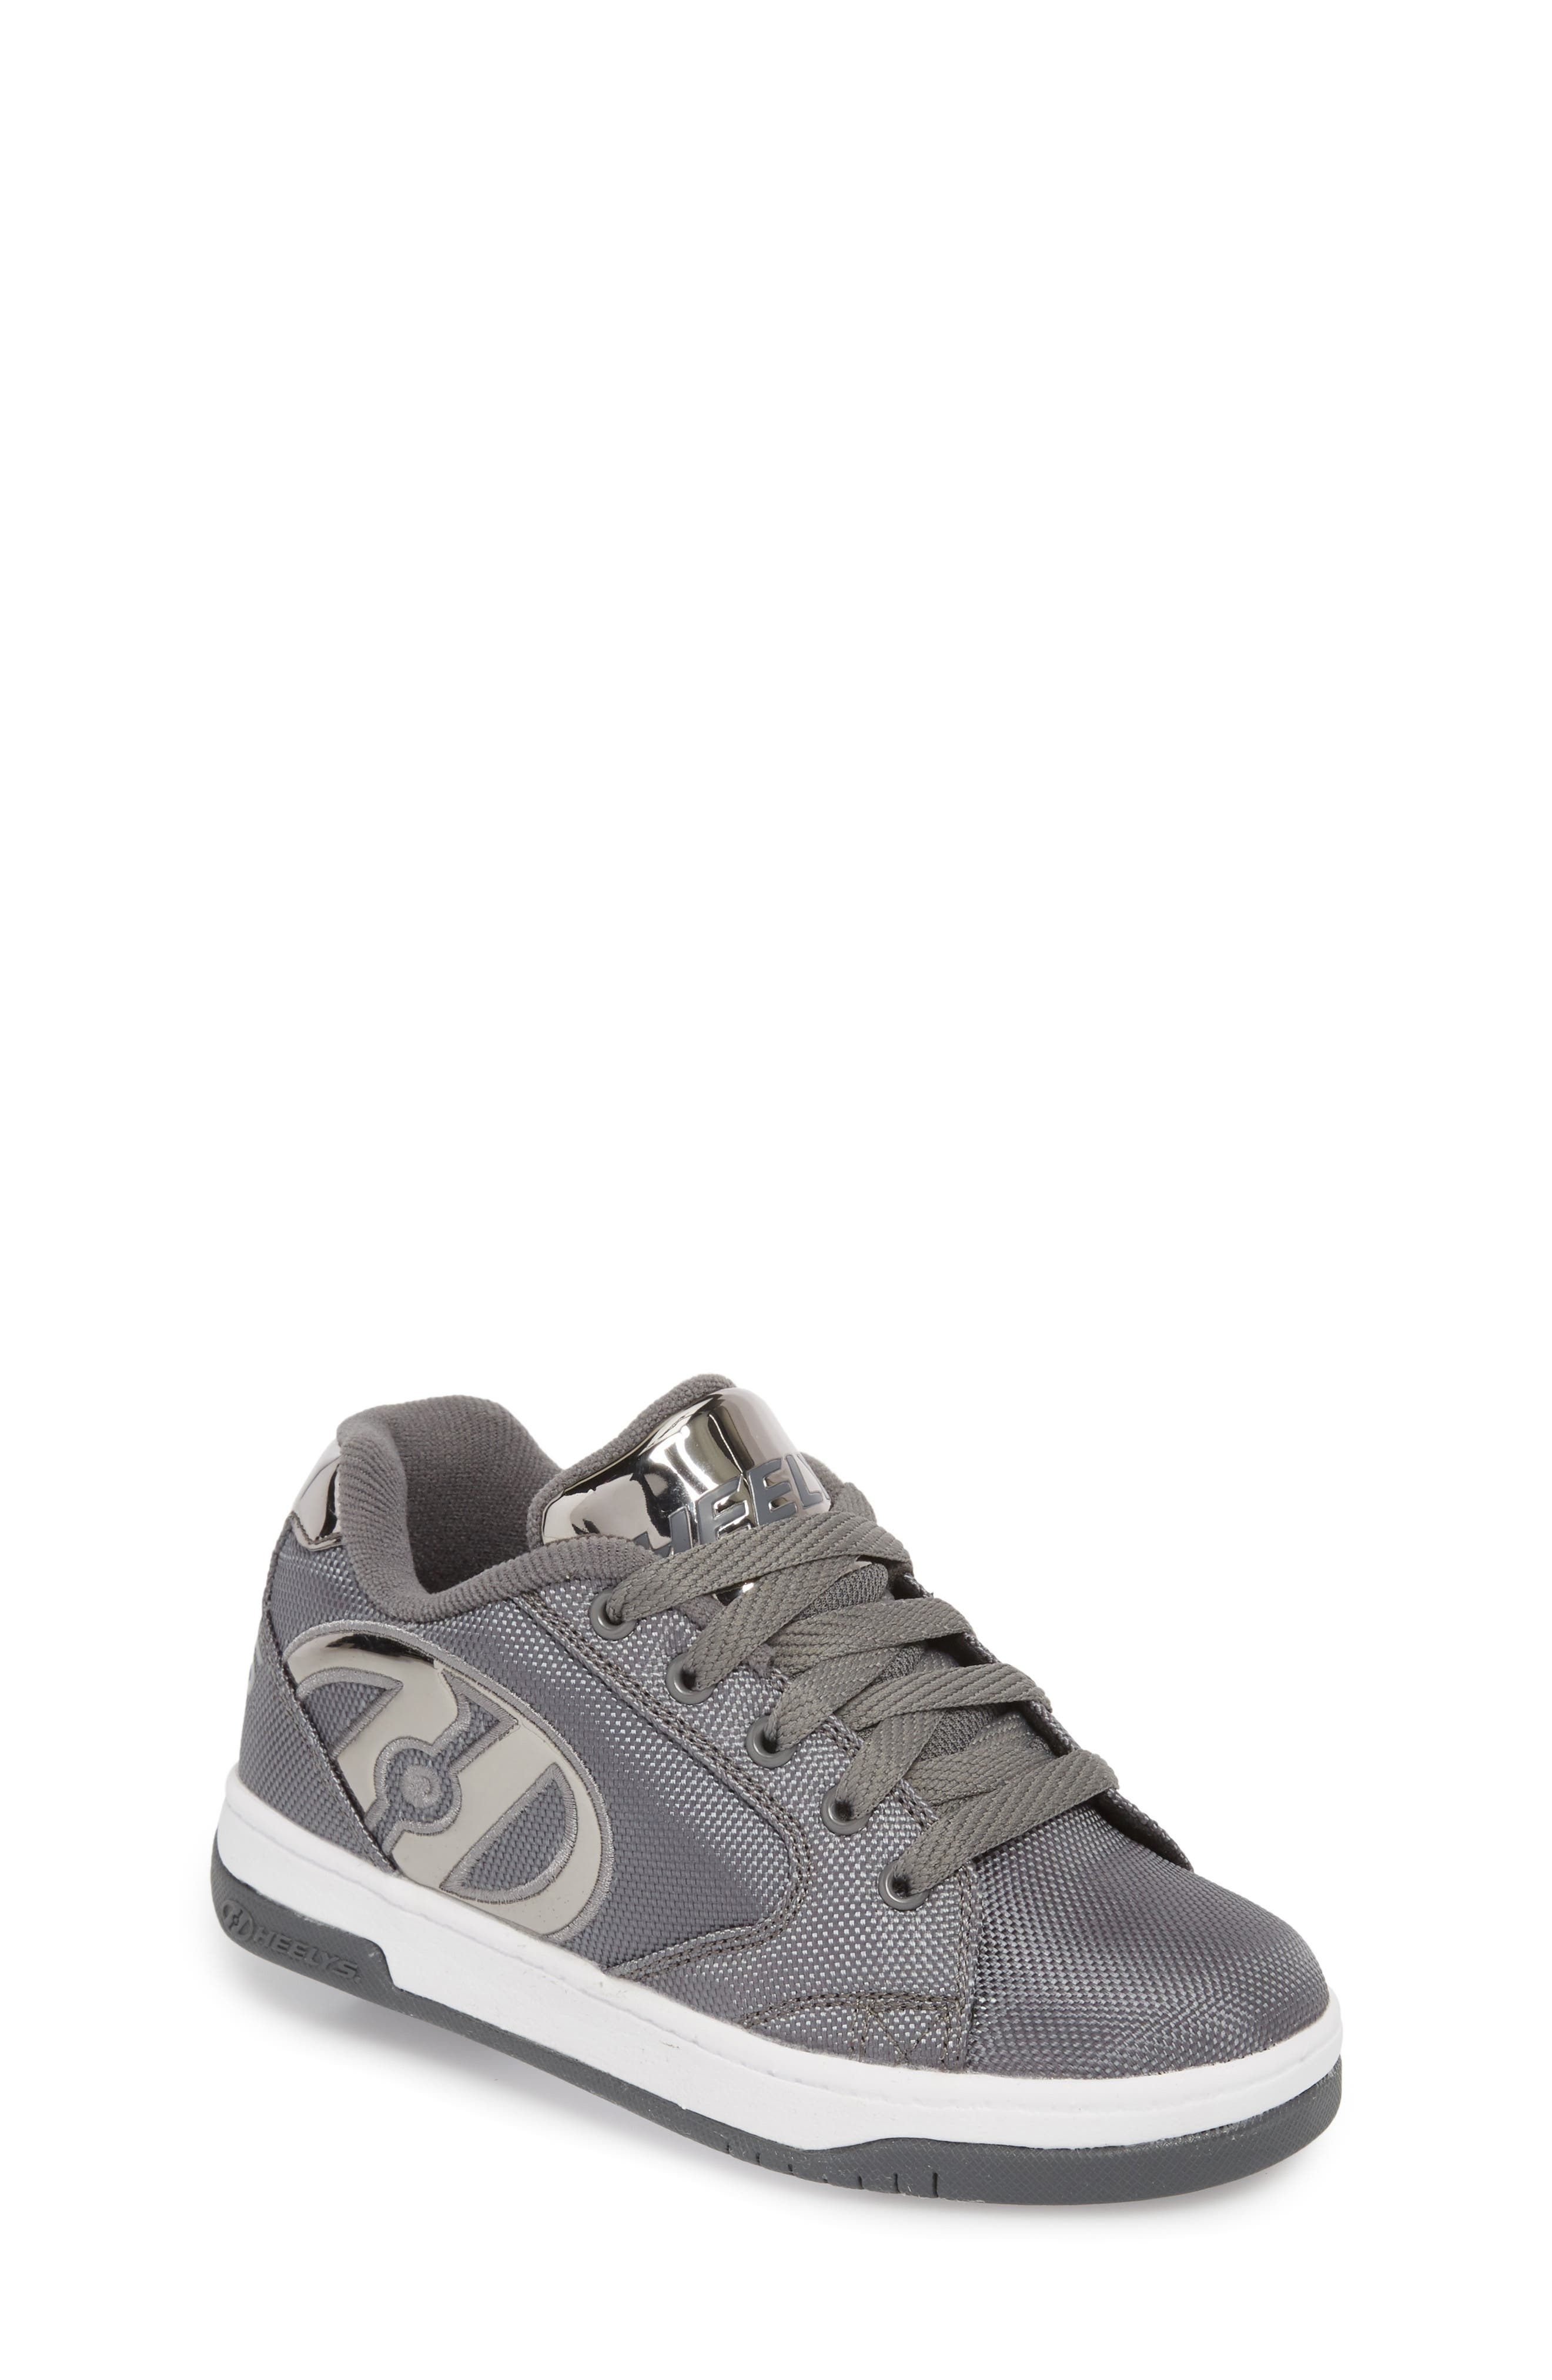 Heels Propel Ballistic Sneaker,                         Main,                         color, Charcoal/ Pewter